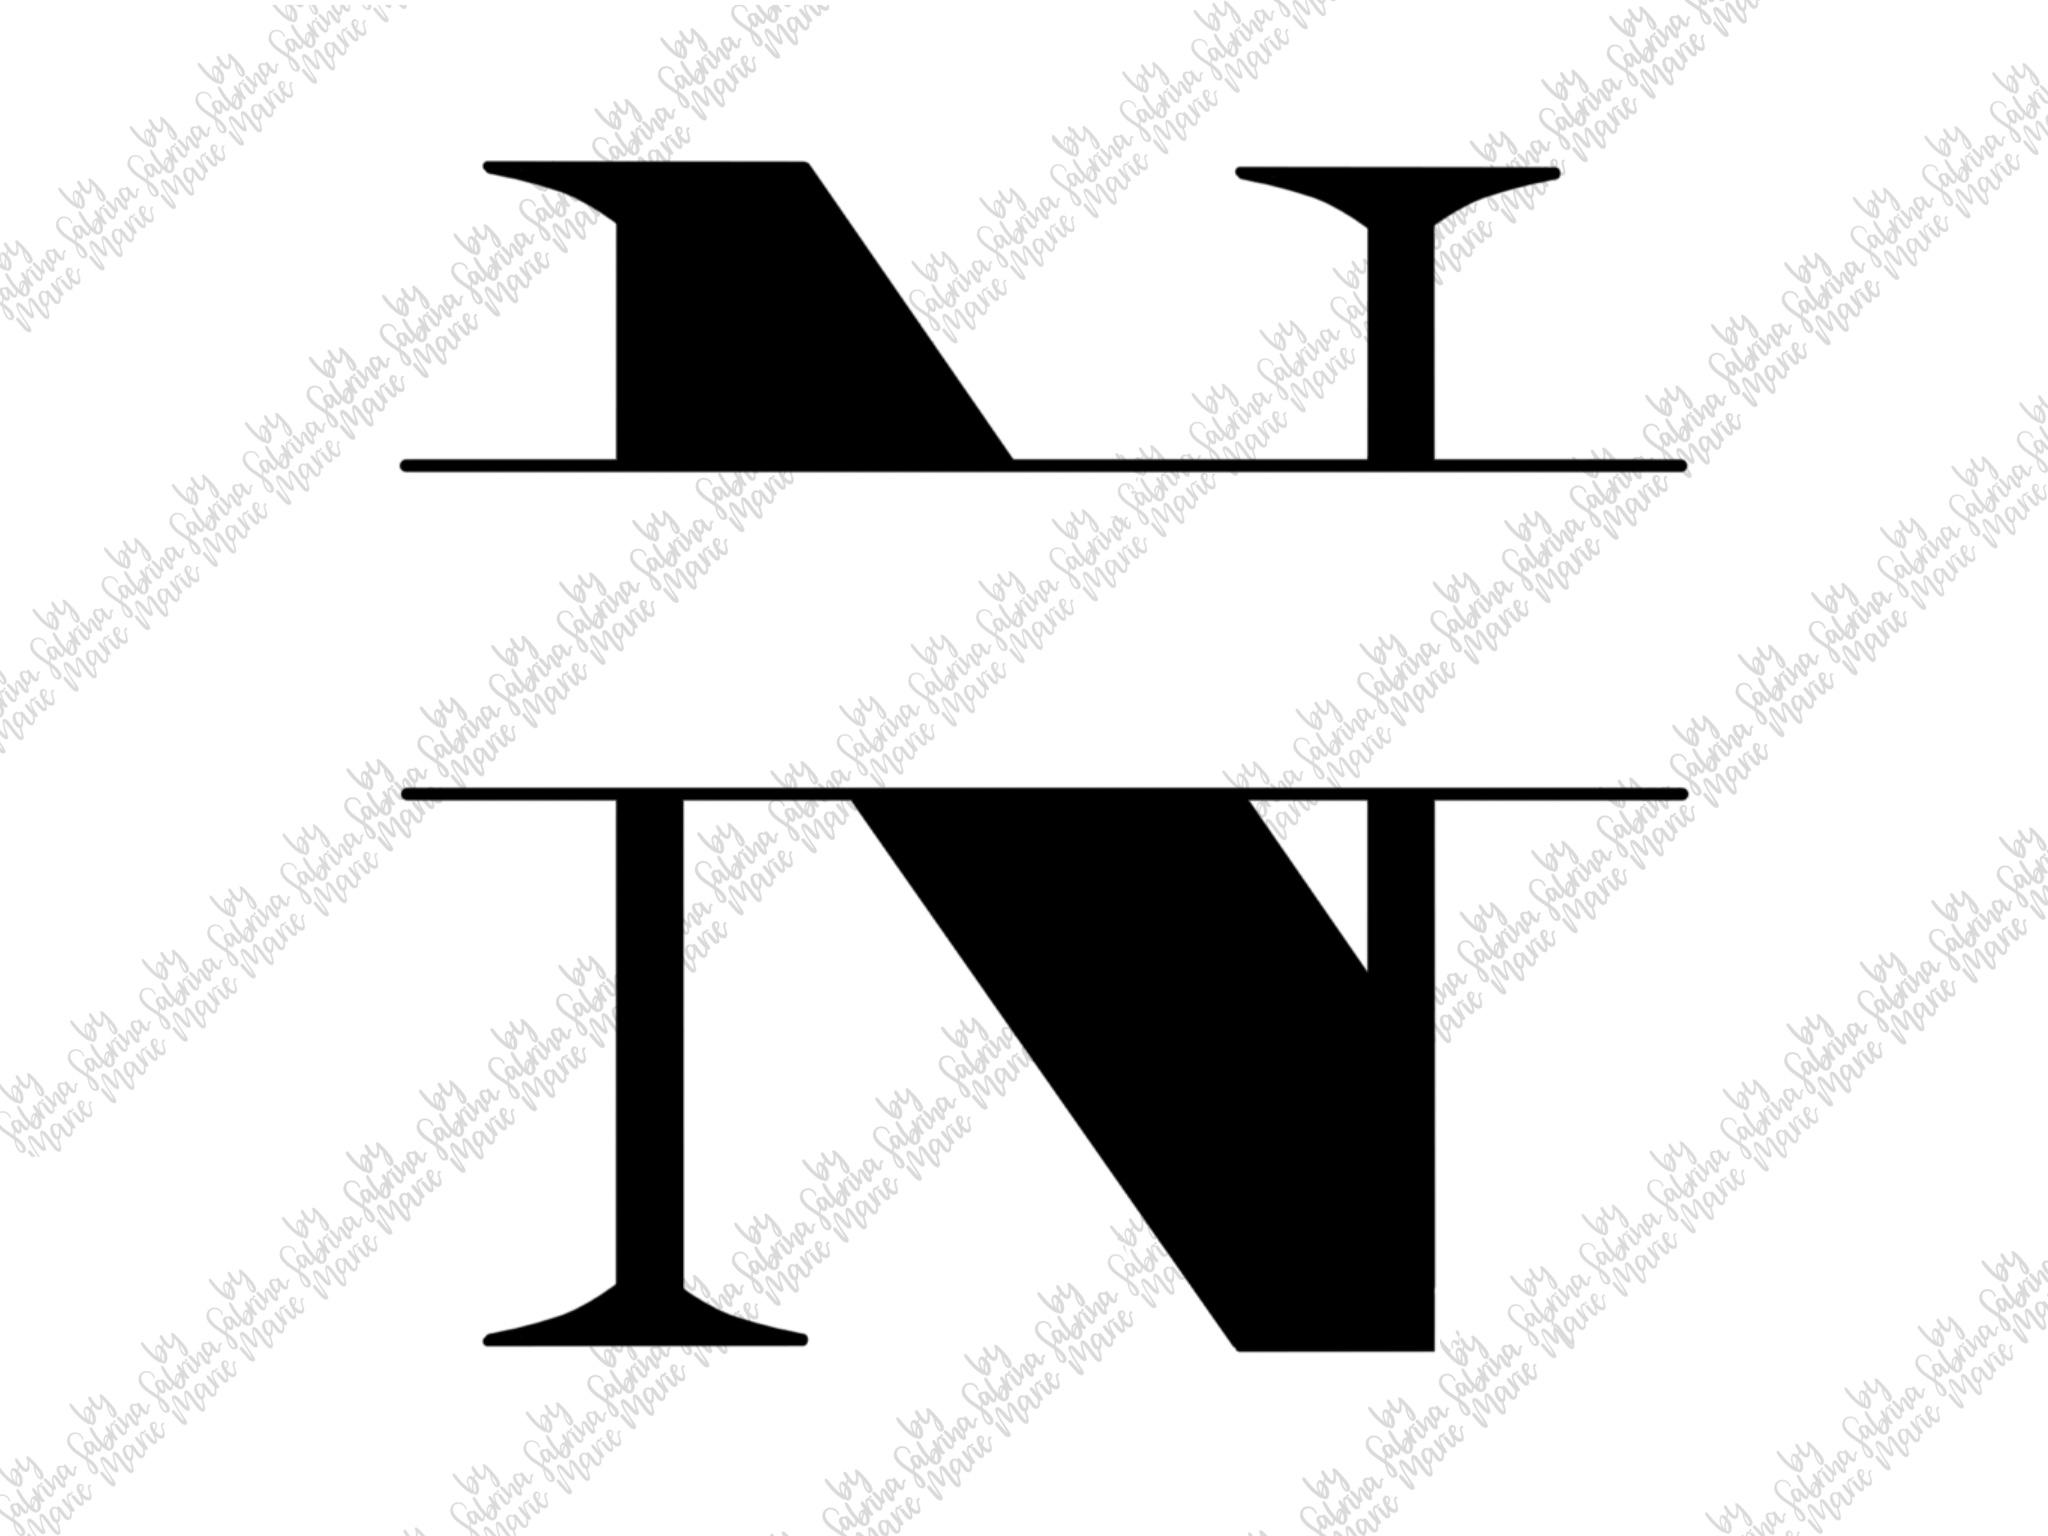 Split Monogram N - Handdrawn - SVG/PNG example image 2